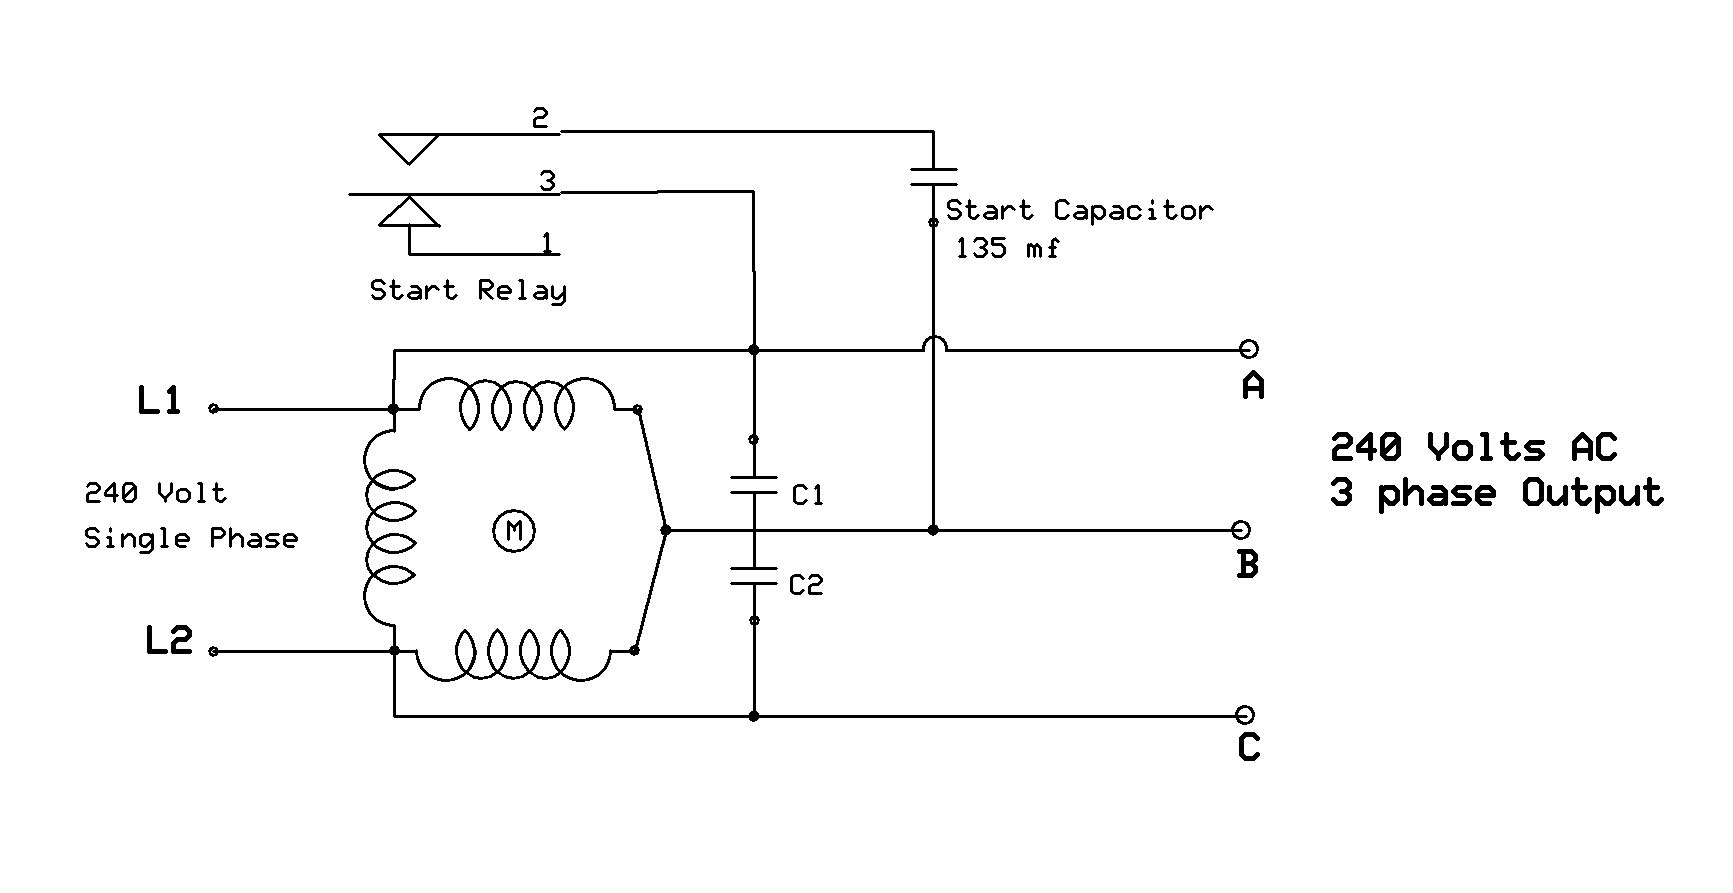 230v electric motor wiring diagram  Wiring images